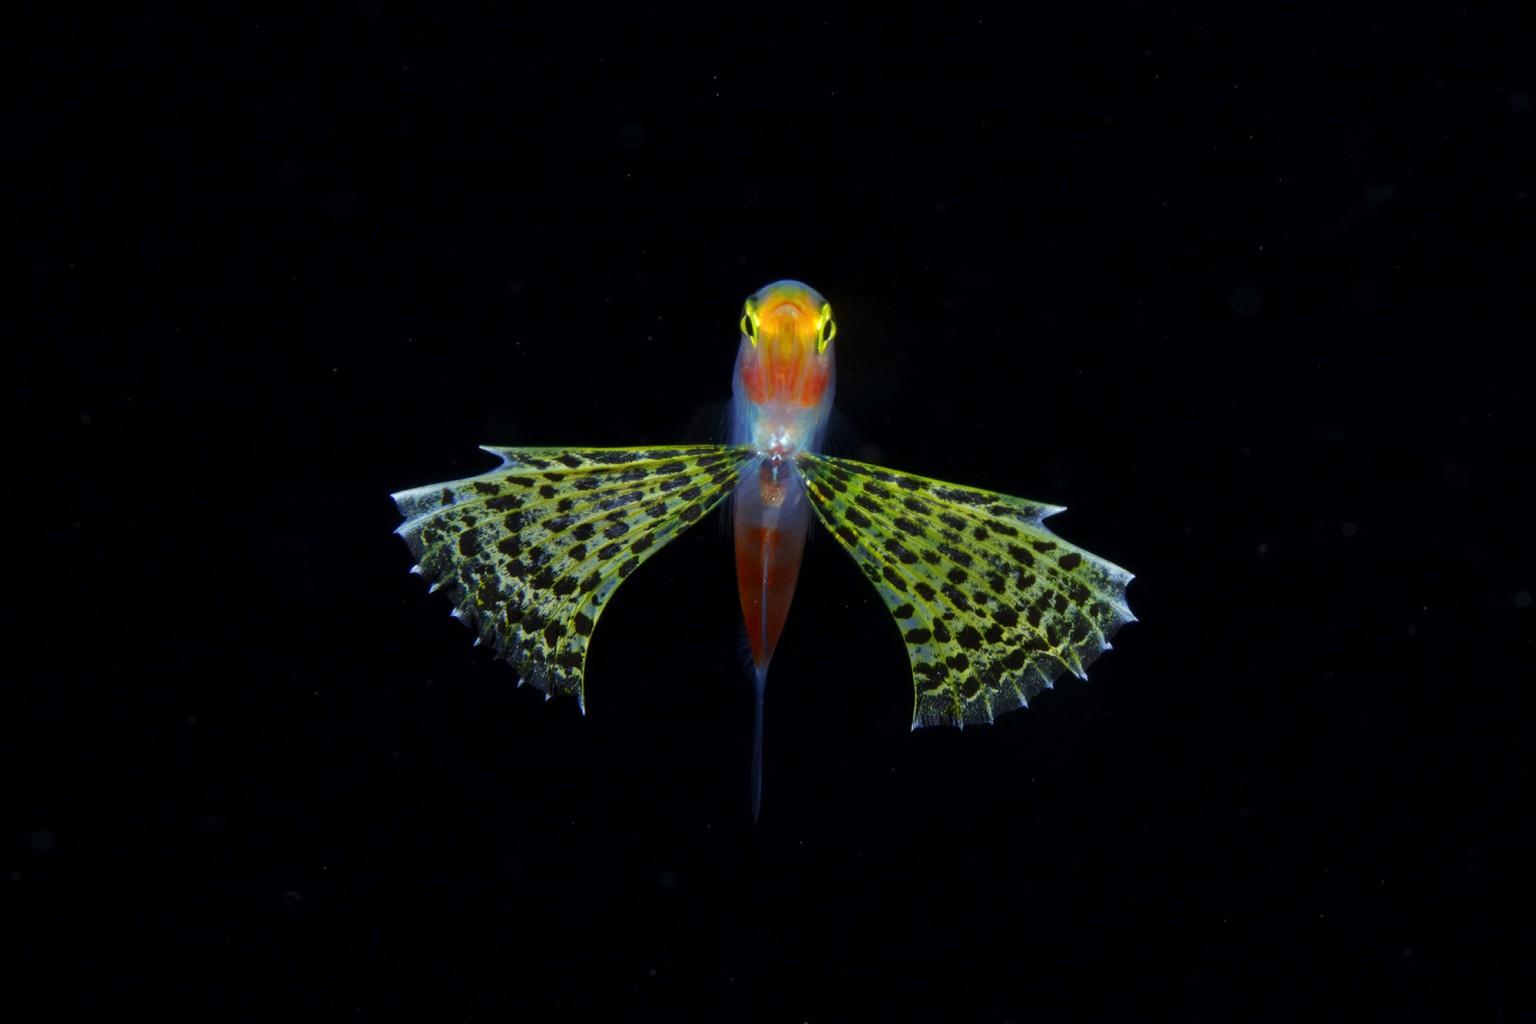 Jewels in the Night Sea: Luminous Plankton Captured in the Dark Waters of the Osezaki Sea